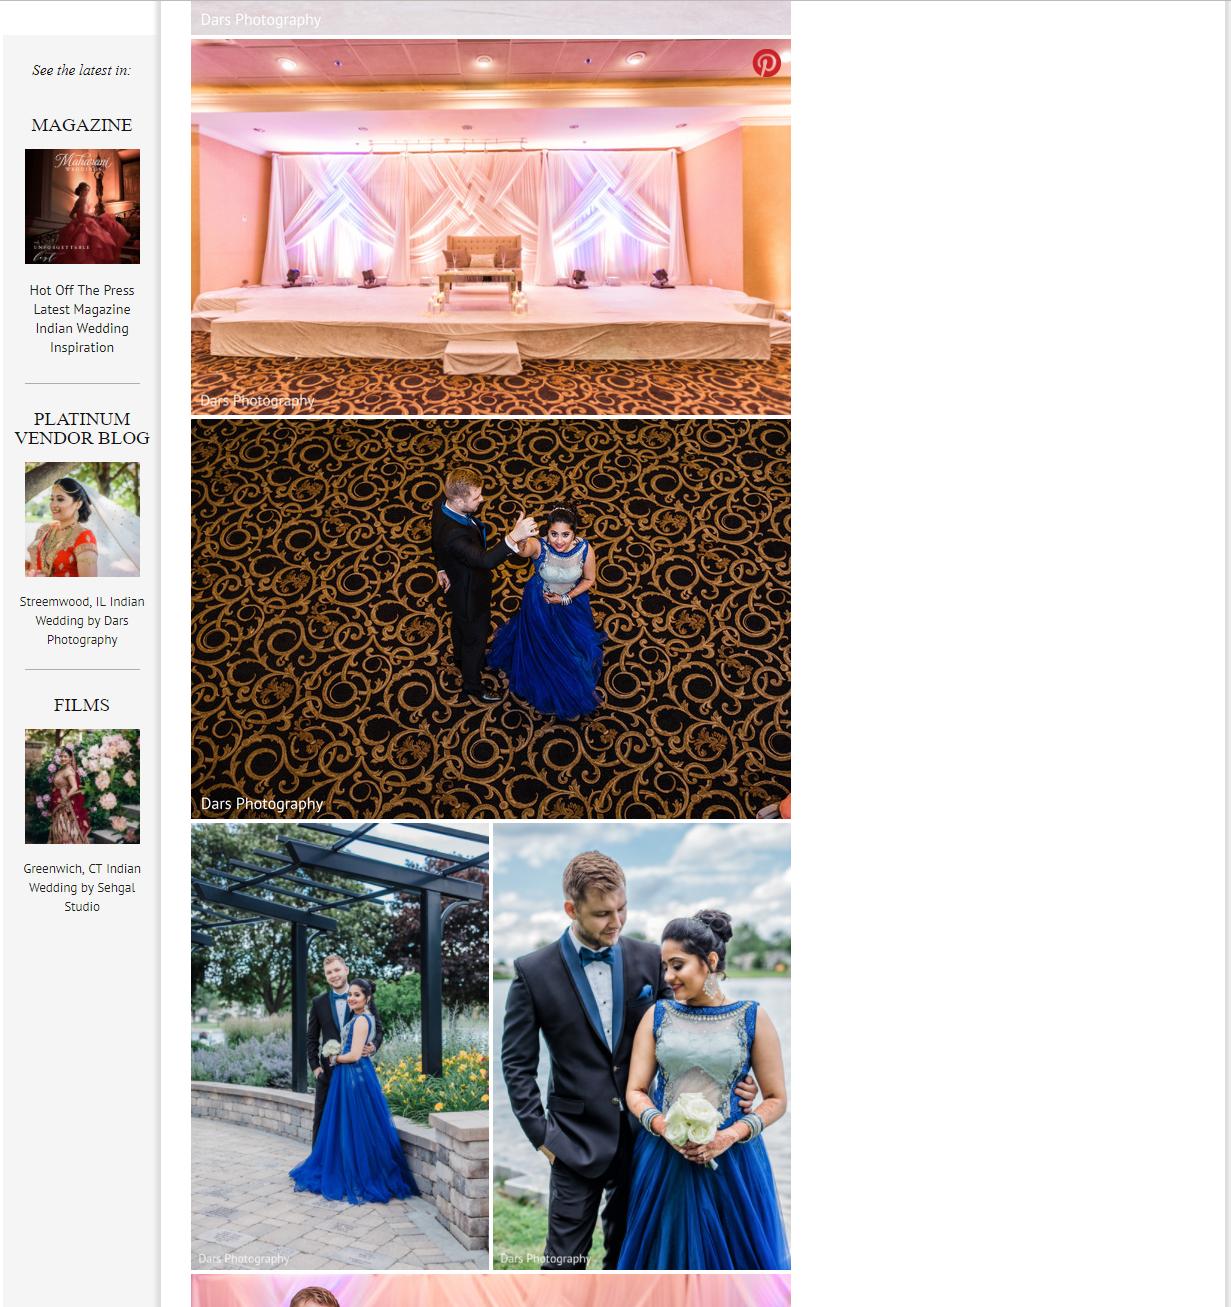 Maharani Wedding Featuring DARS Photography